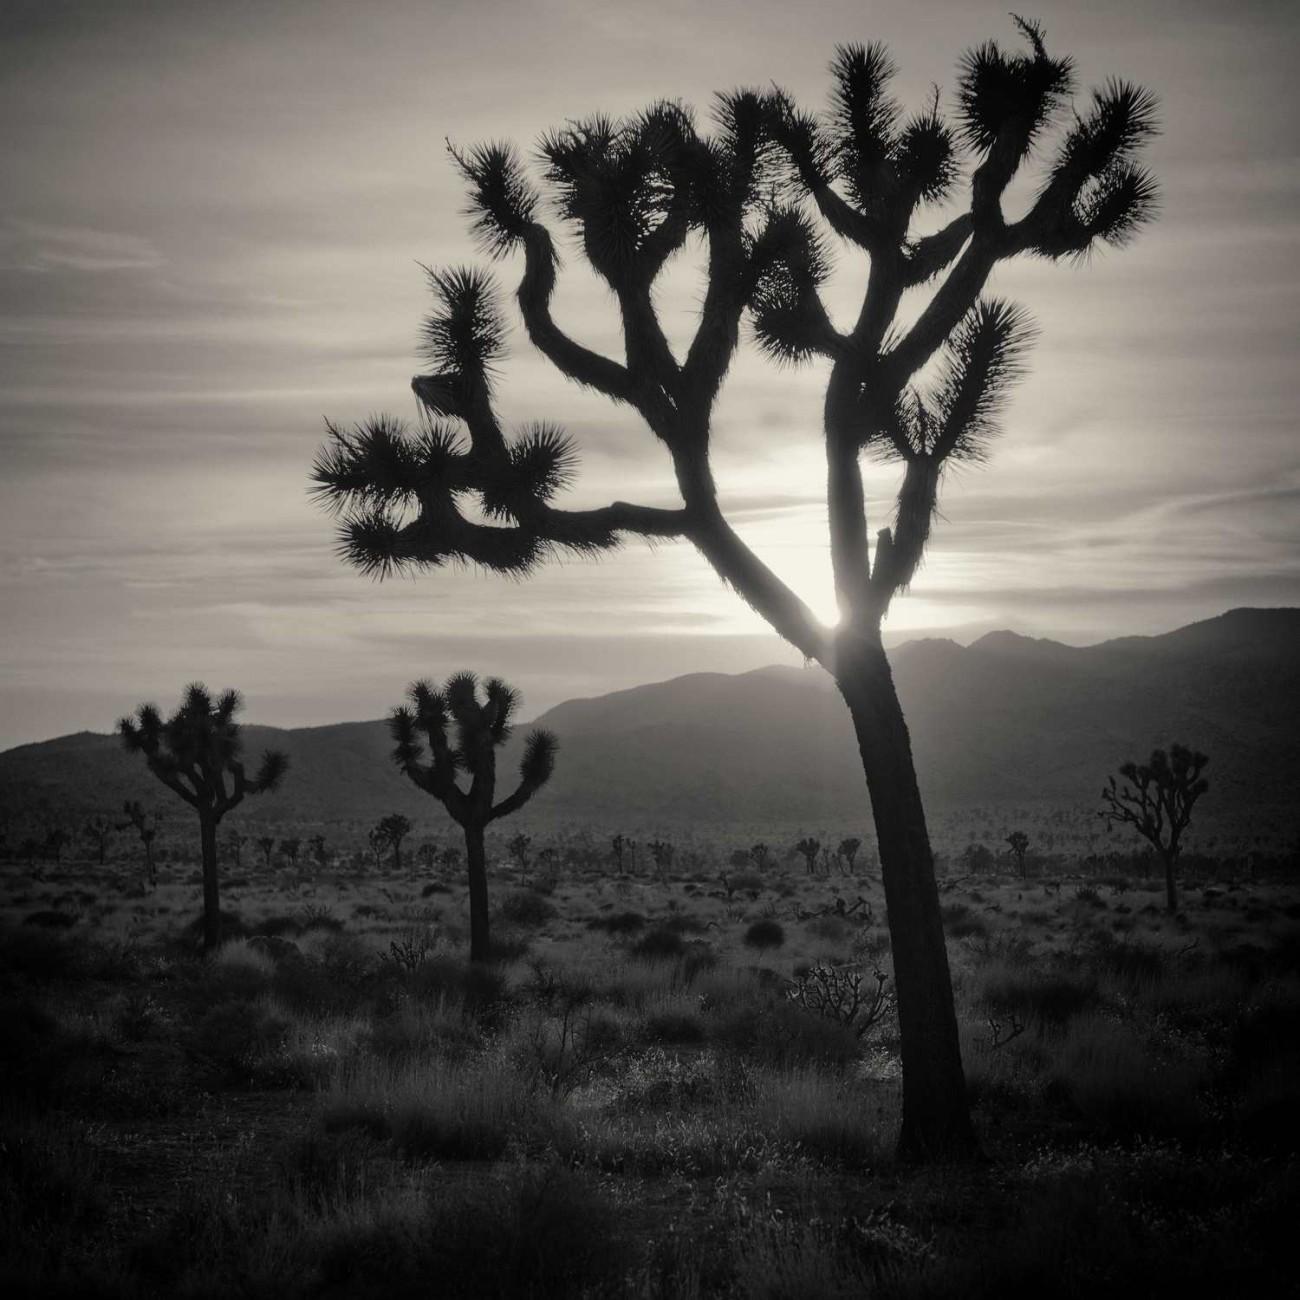 Joshua trees with sun, California, 2012